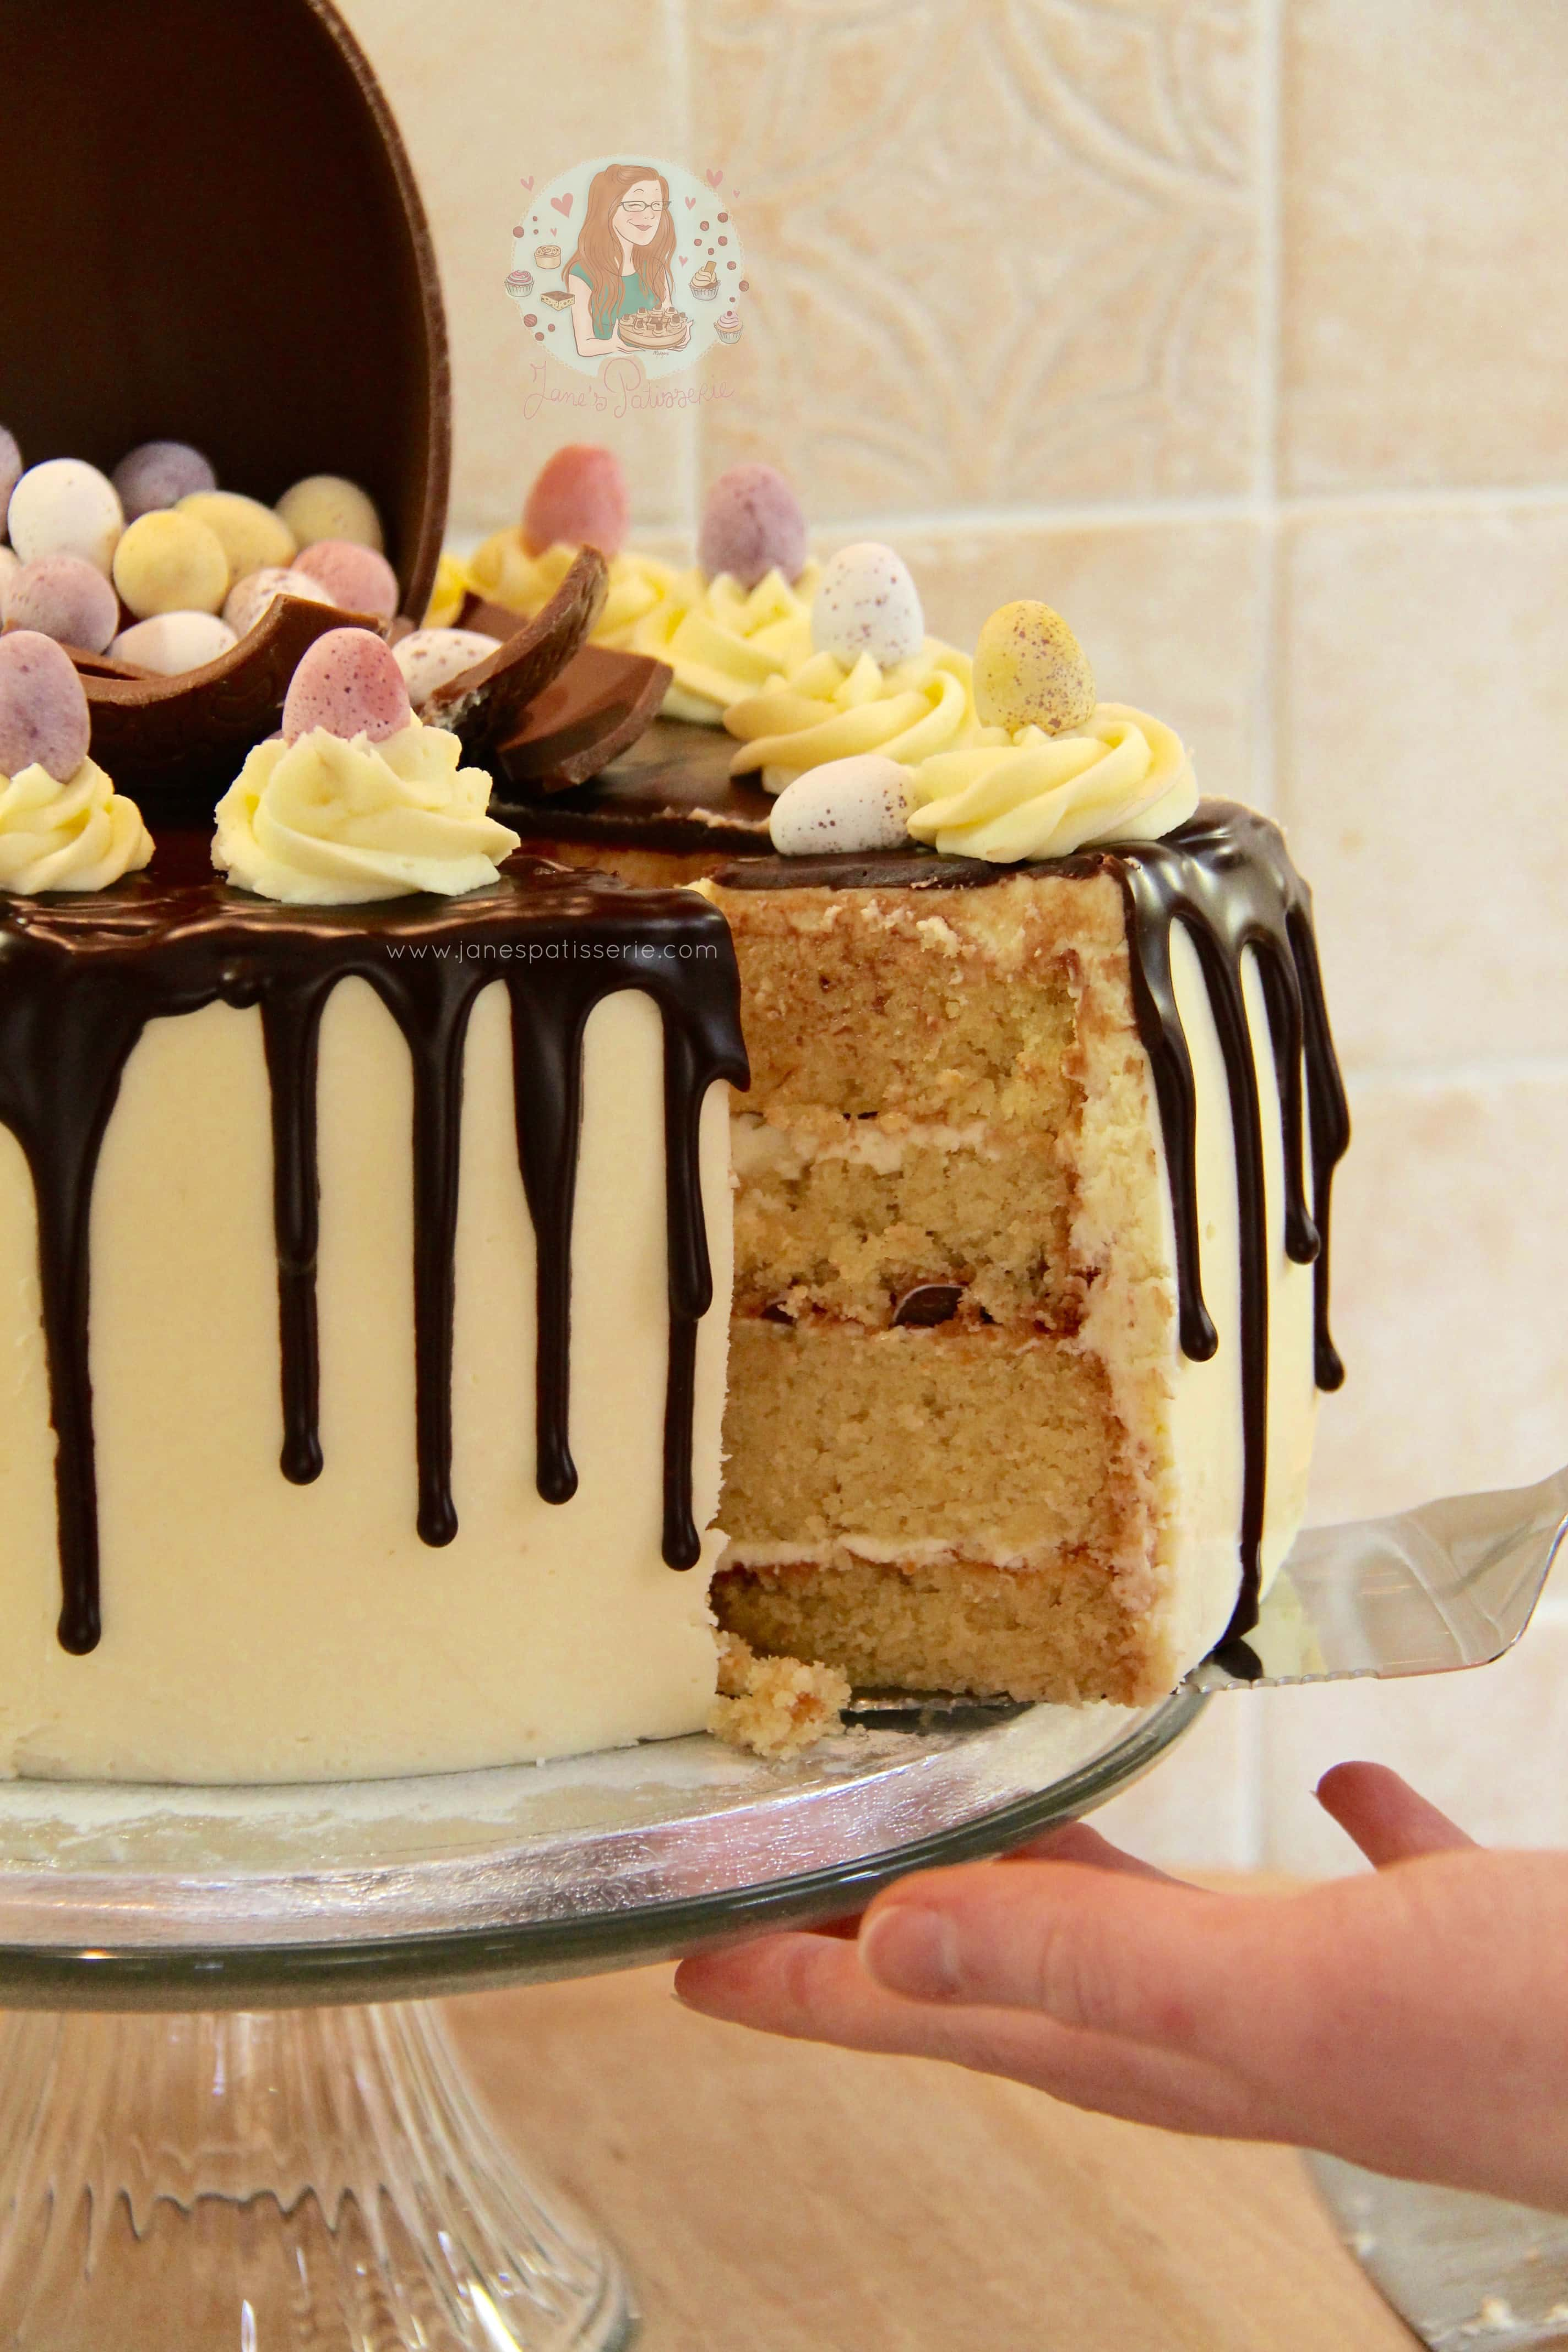 Mini Egg Cake! - Jane's Patisserie